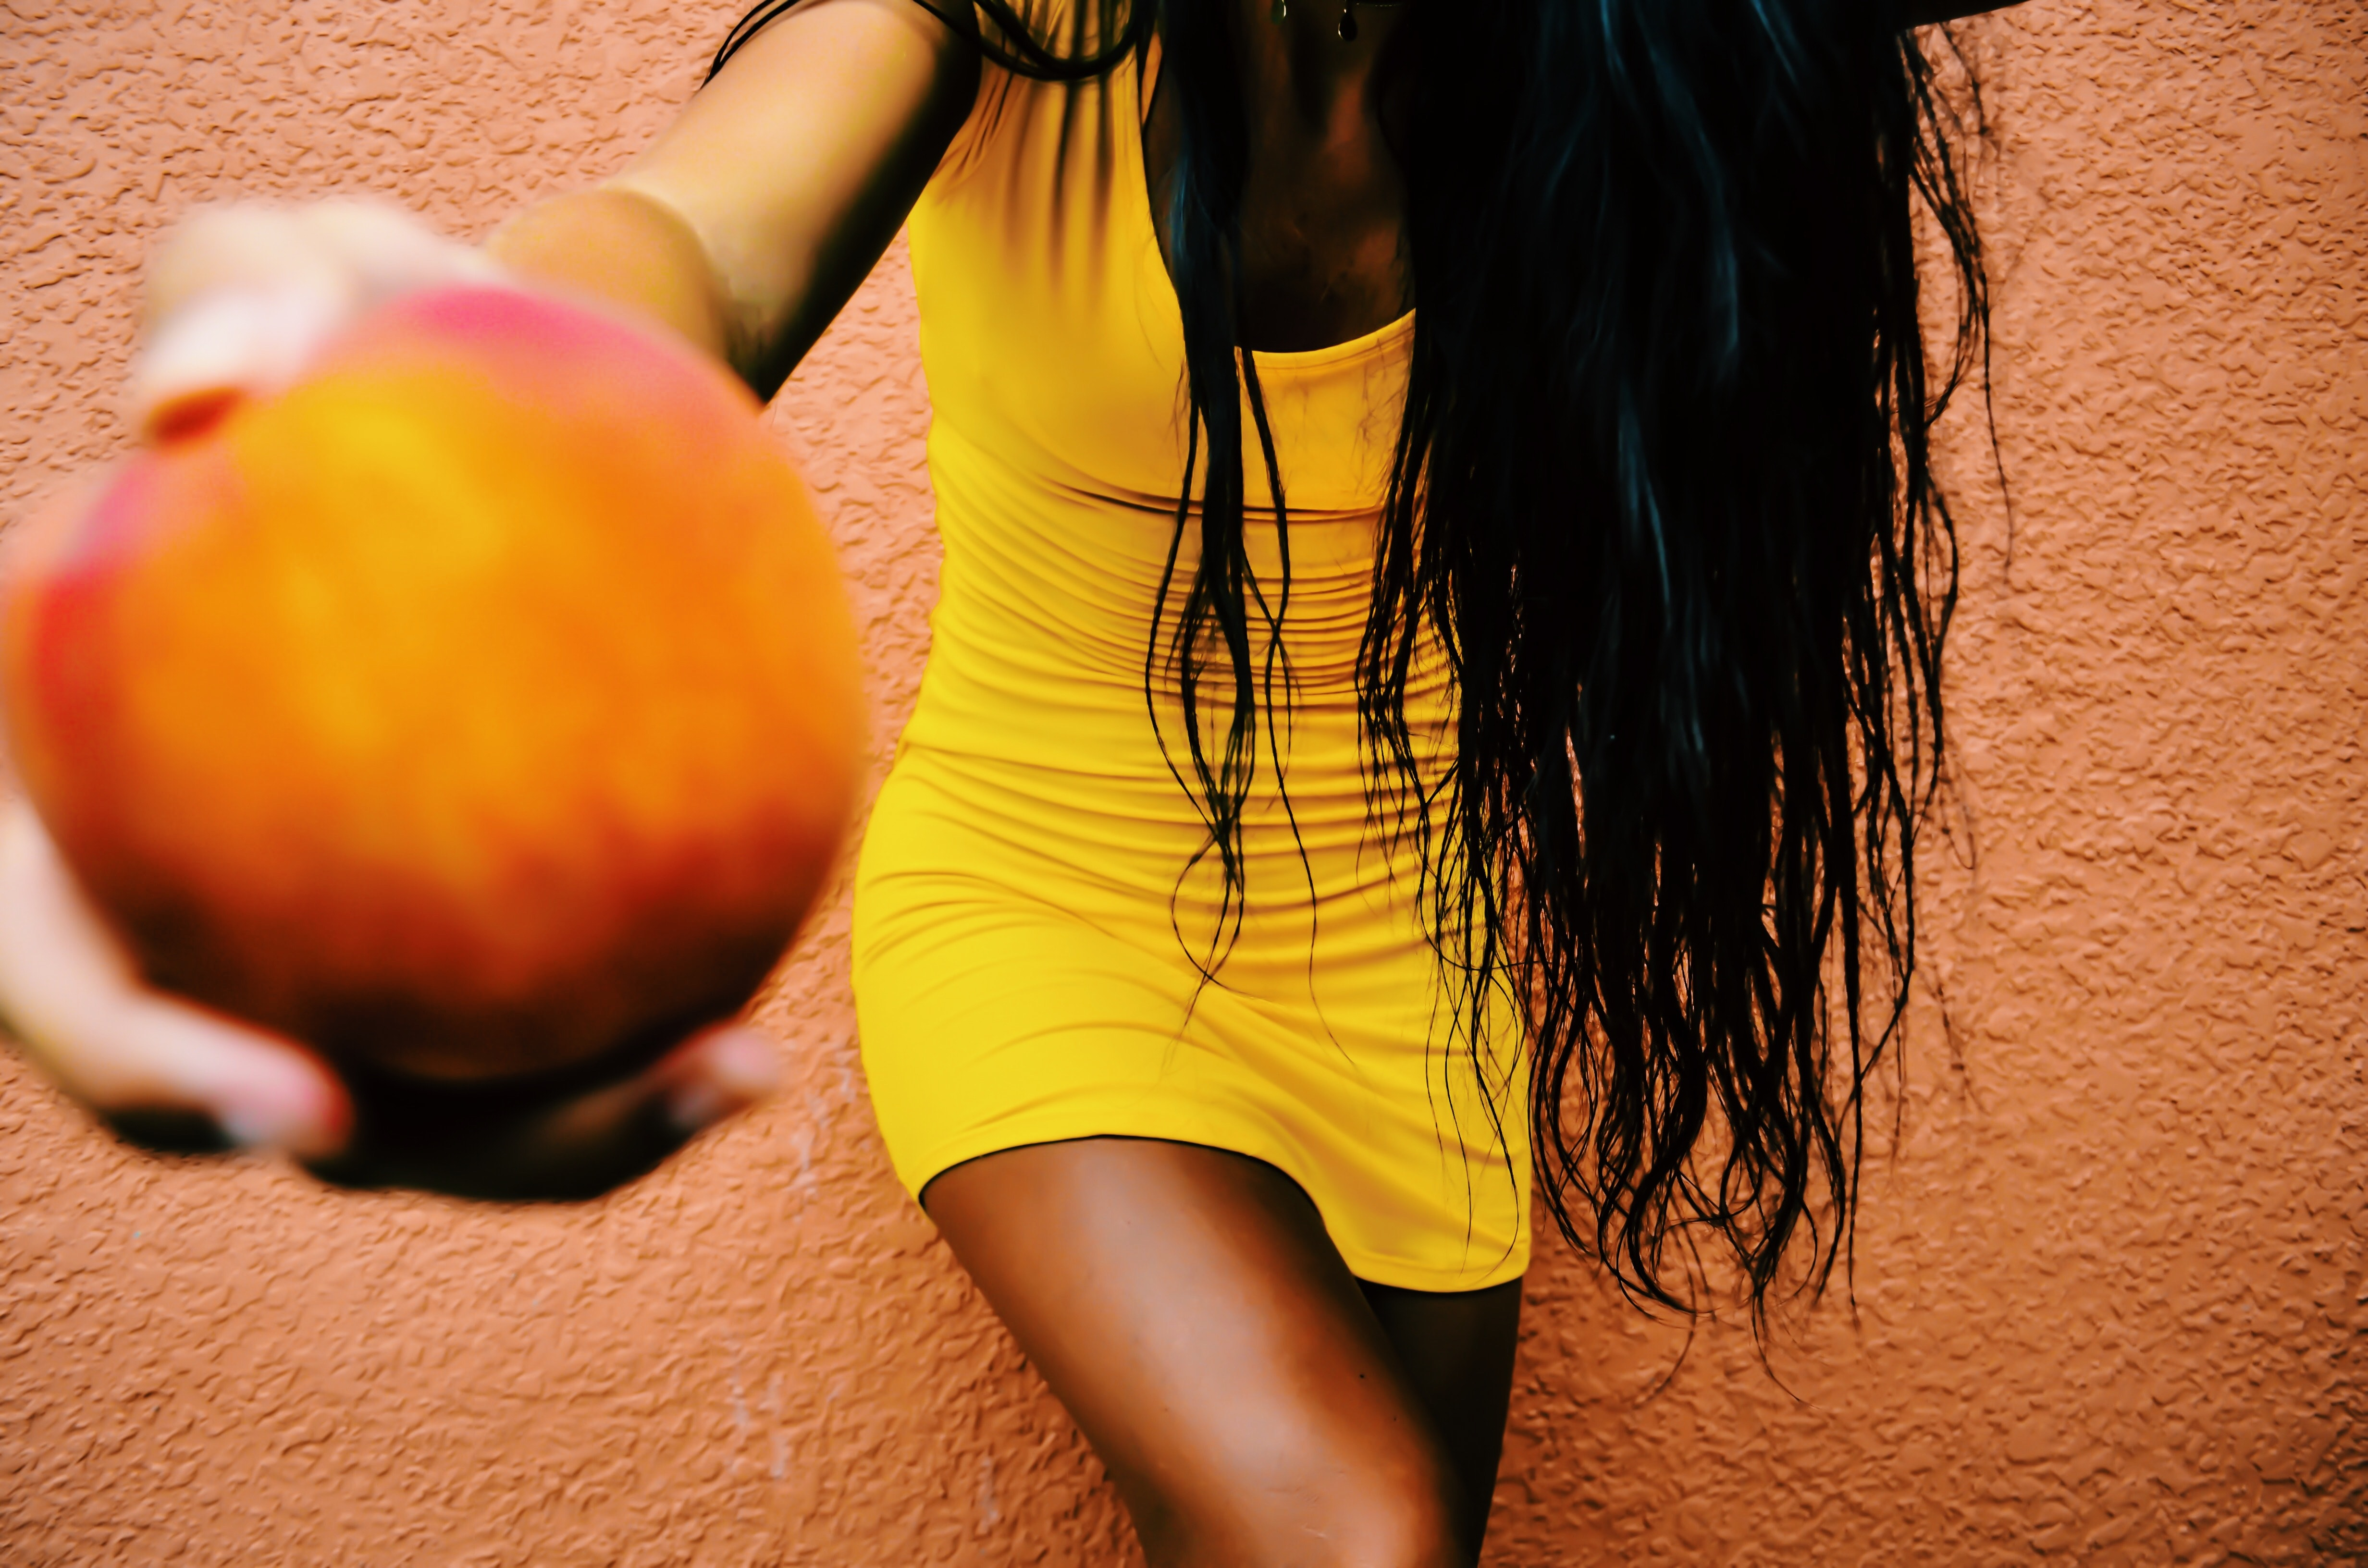 Woman holding round fruit while leaning on orange wall photo